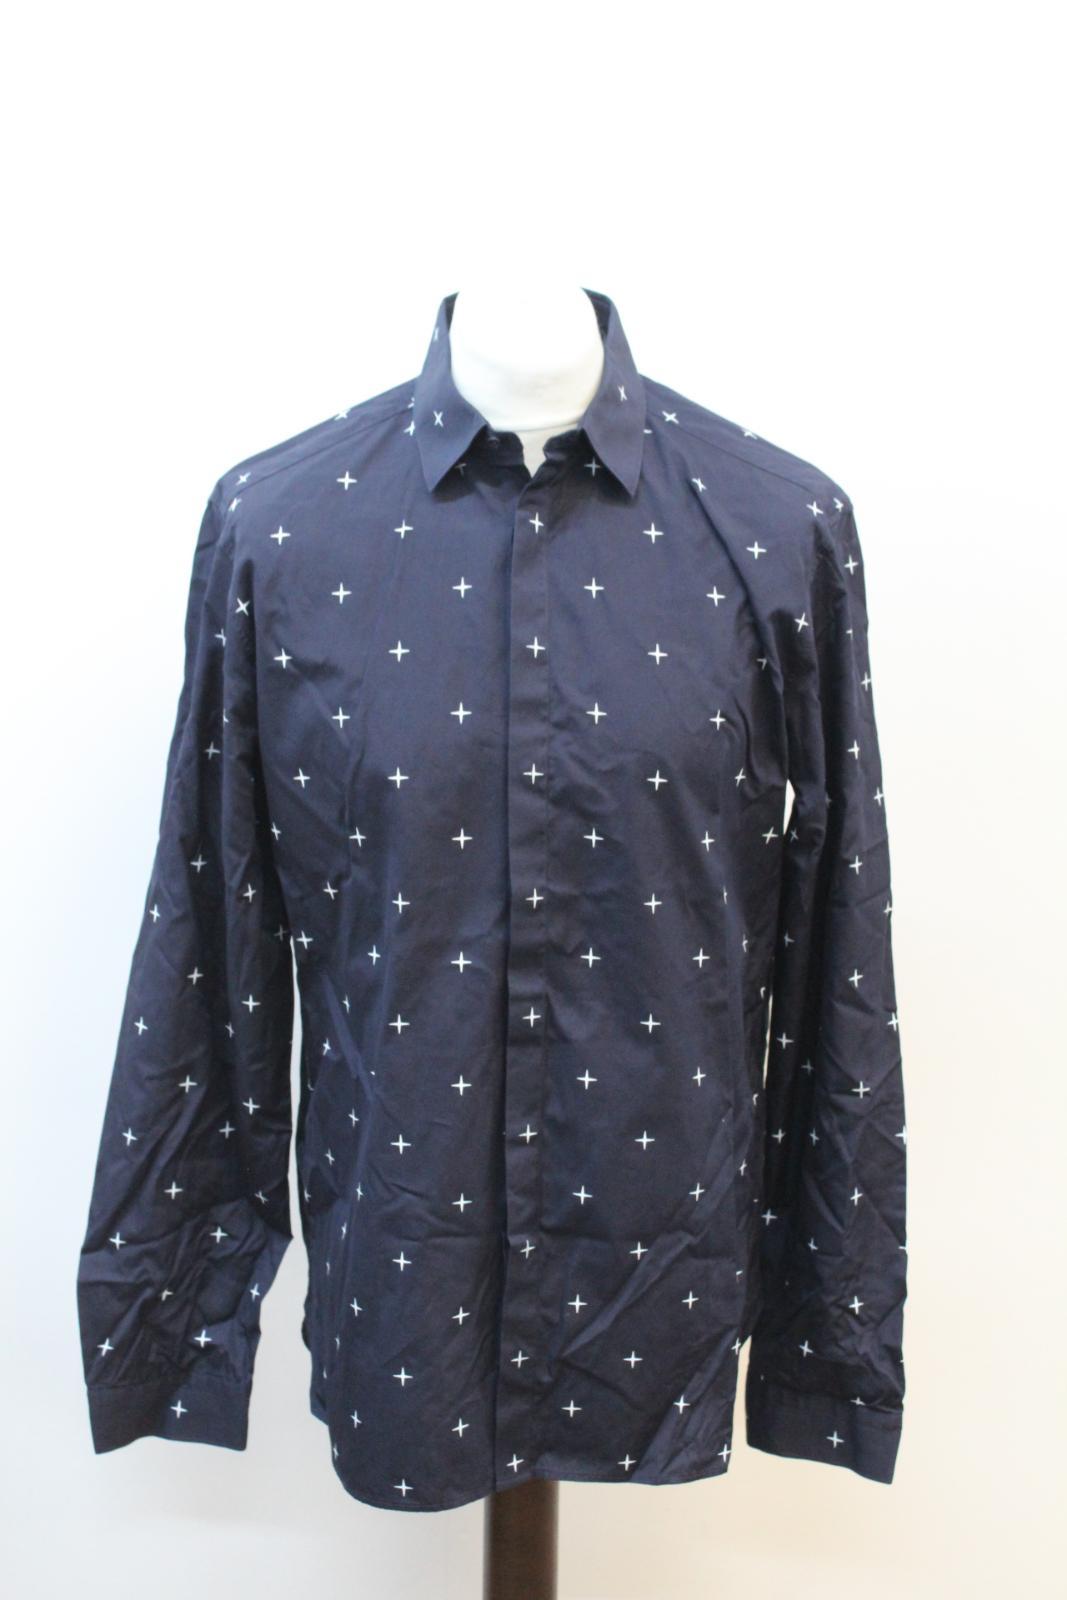 Neil-Barrett-Hombre-Azul-Marino-Blanco-Cuello-De-Camisa-formal-calce-Cruz-16-5-034-42cm miniatura 7